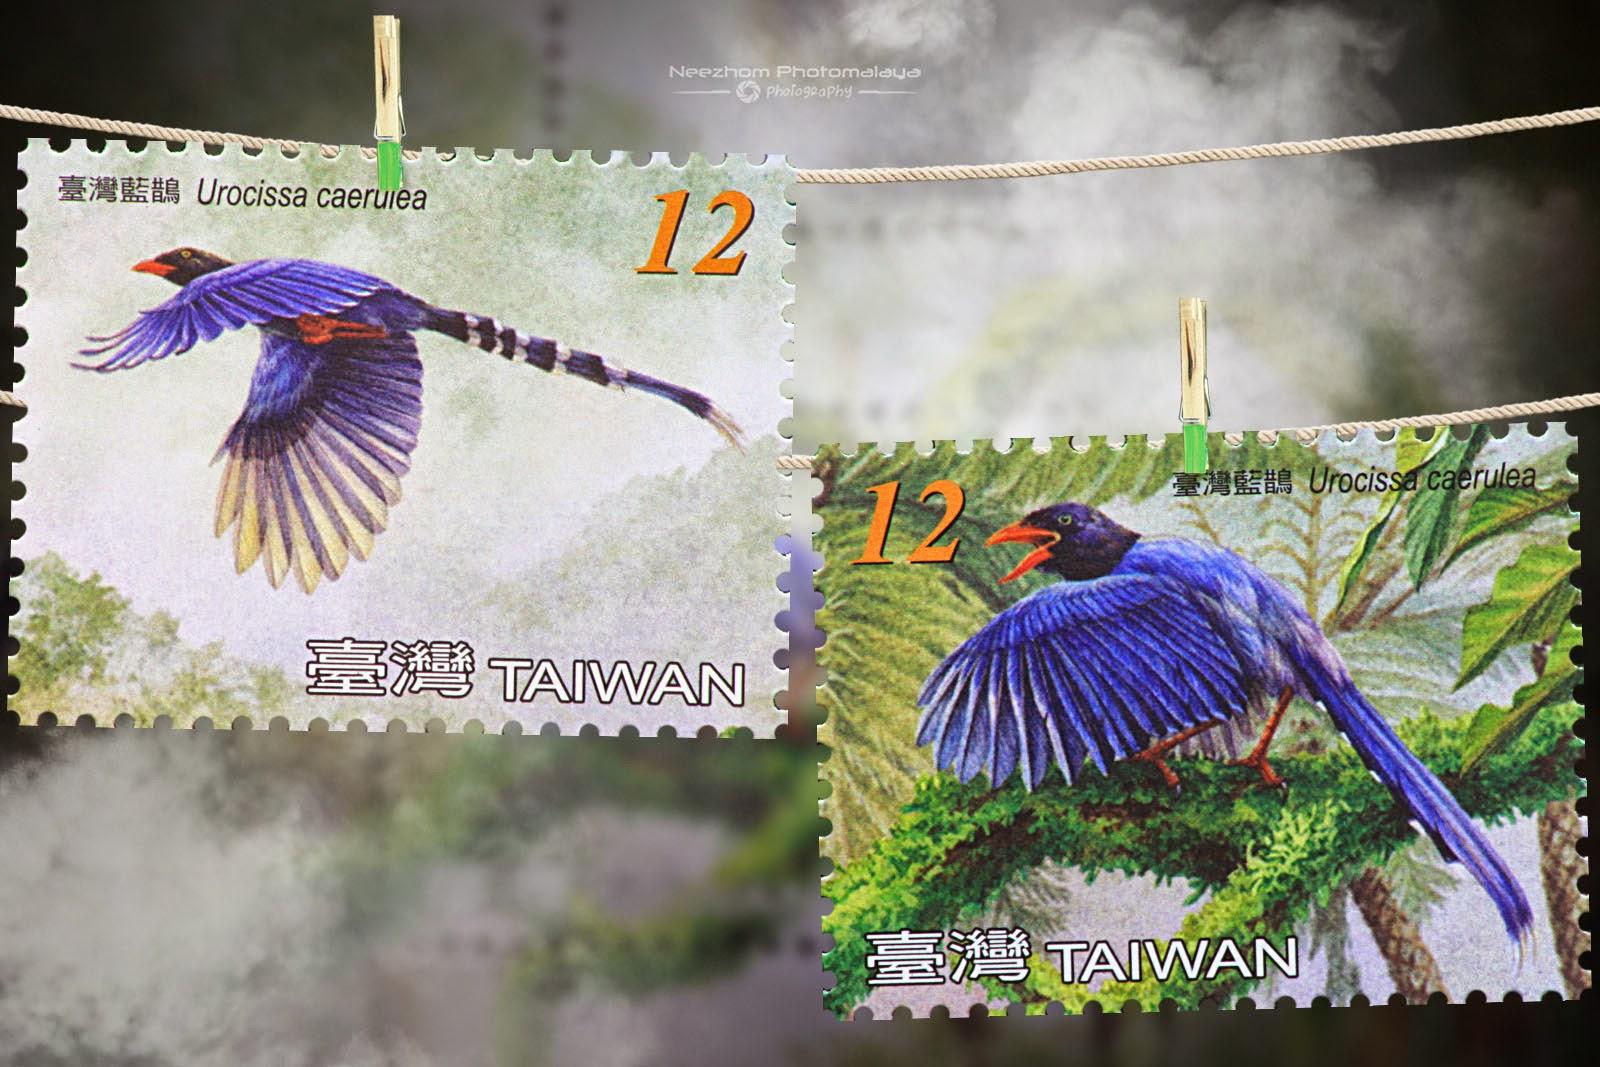 Taiwan 2008 Blue Magpie stamp - Urocissa caerulea NT$12